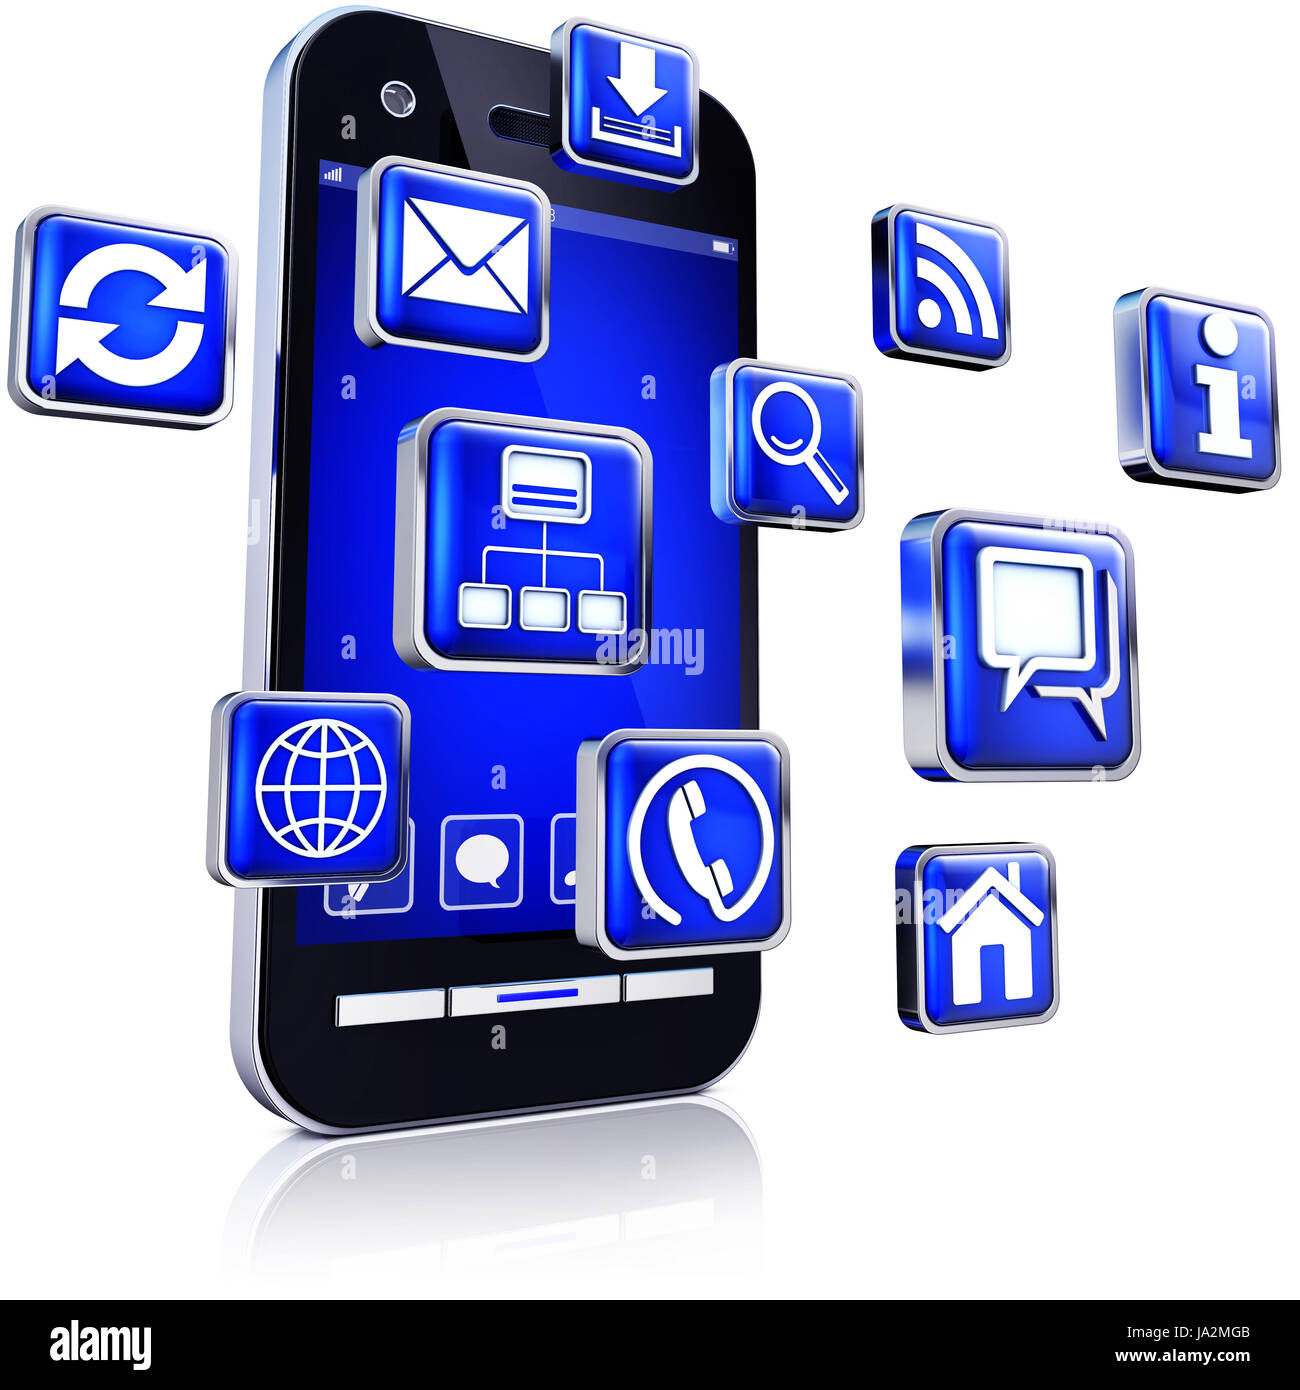 telephone, phone, programs, download, internet, www, worldwideweb, net, web, - Stock Image